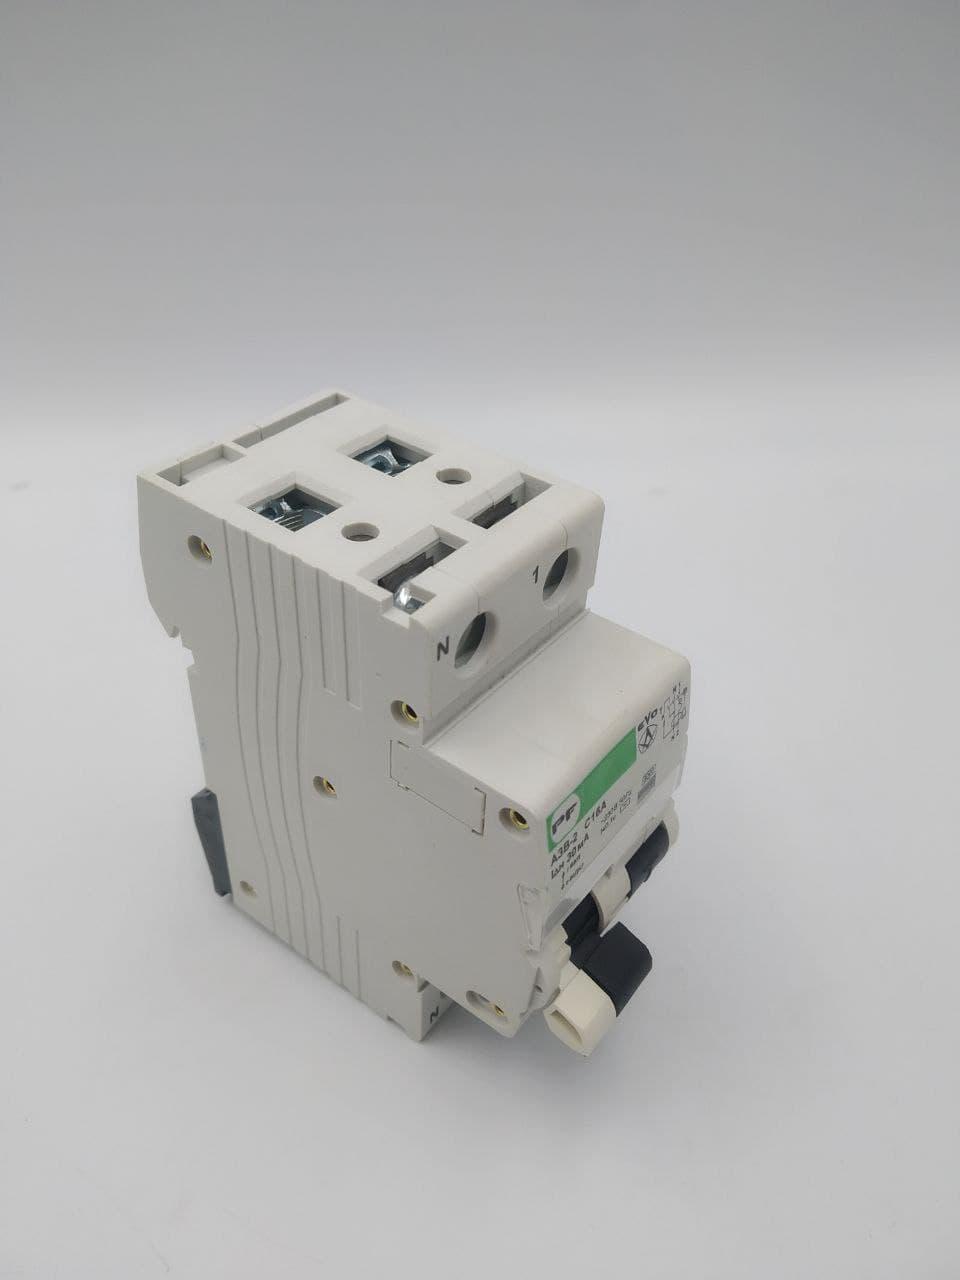 Автоматический выключатель защитного отключения ПРОМФАКТОР АЗВ-2 EVO 1Р+N С16А/0,03А